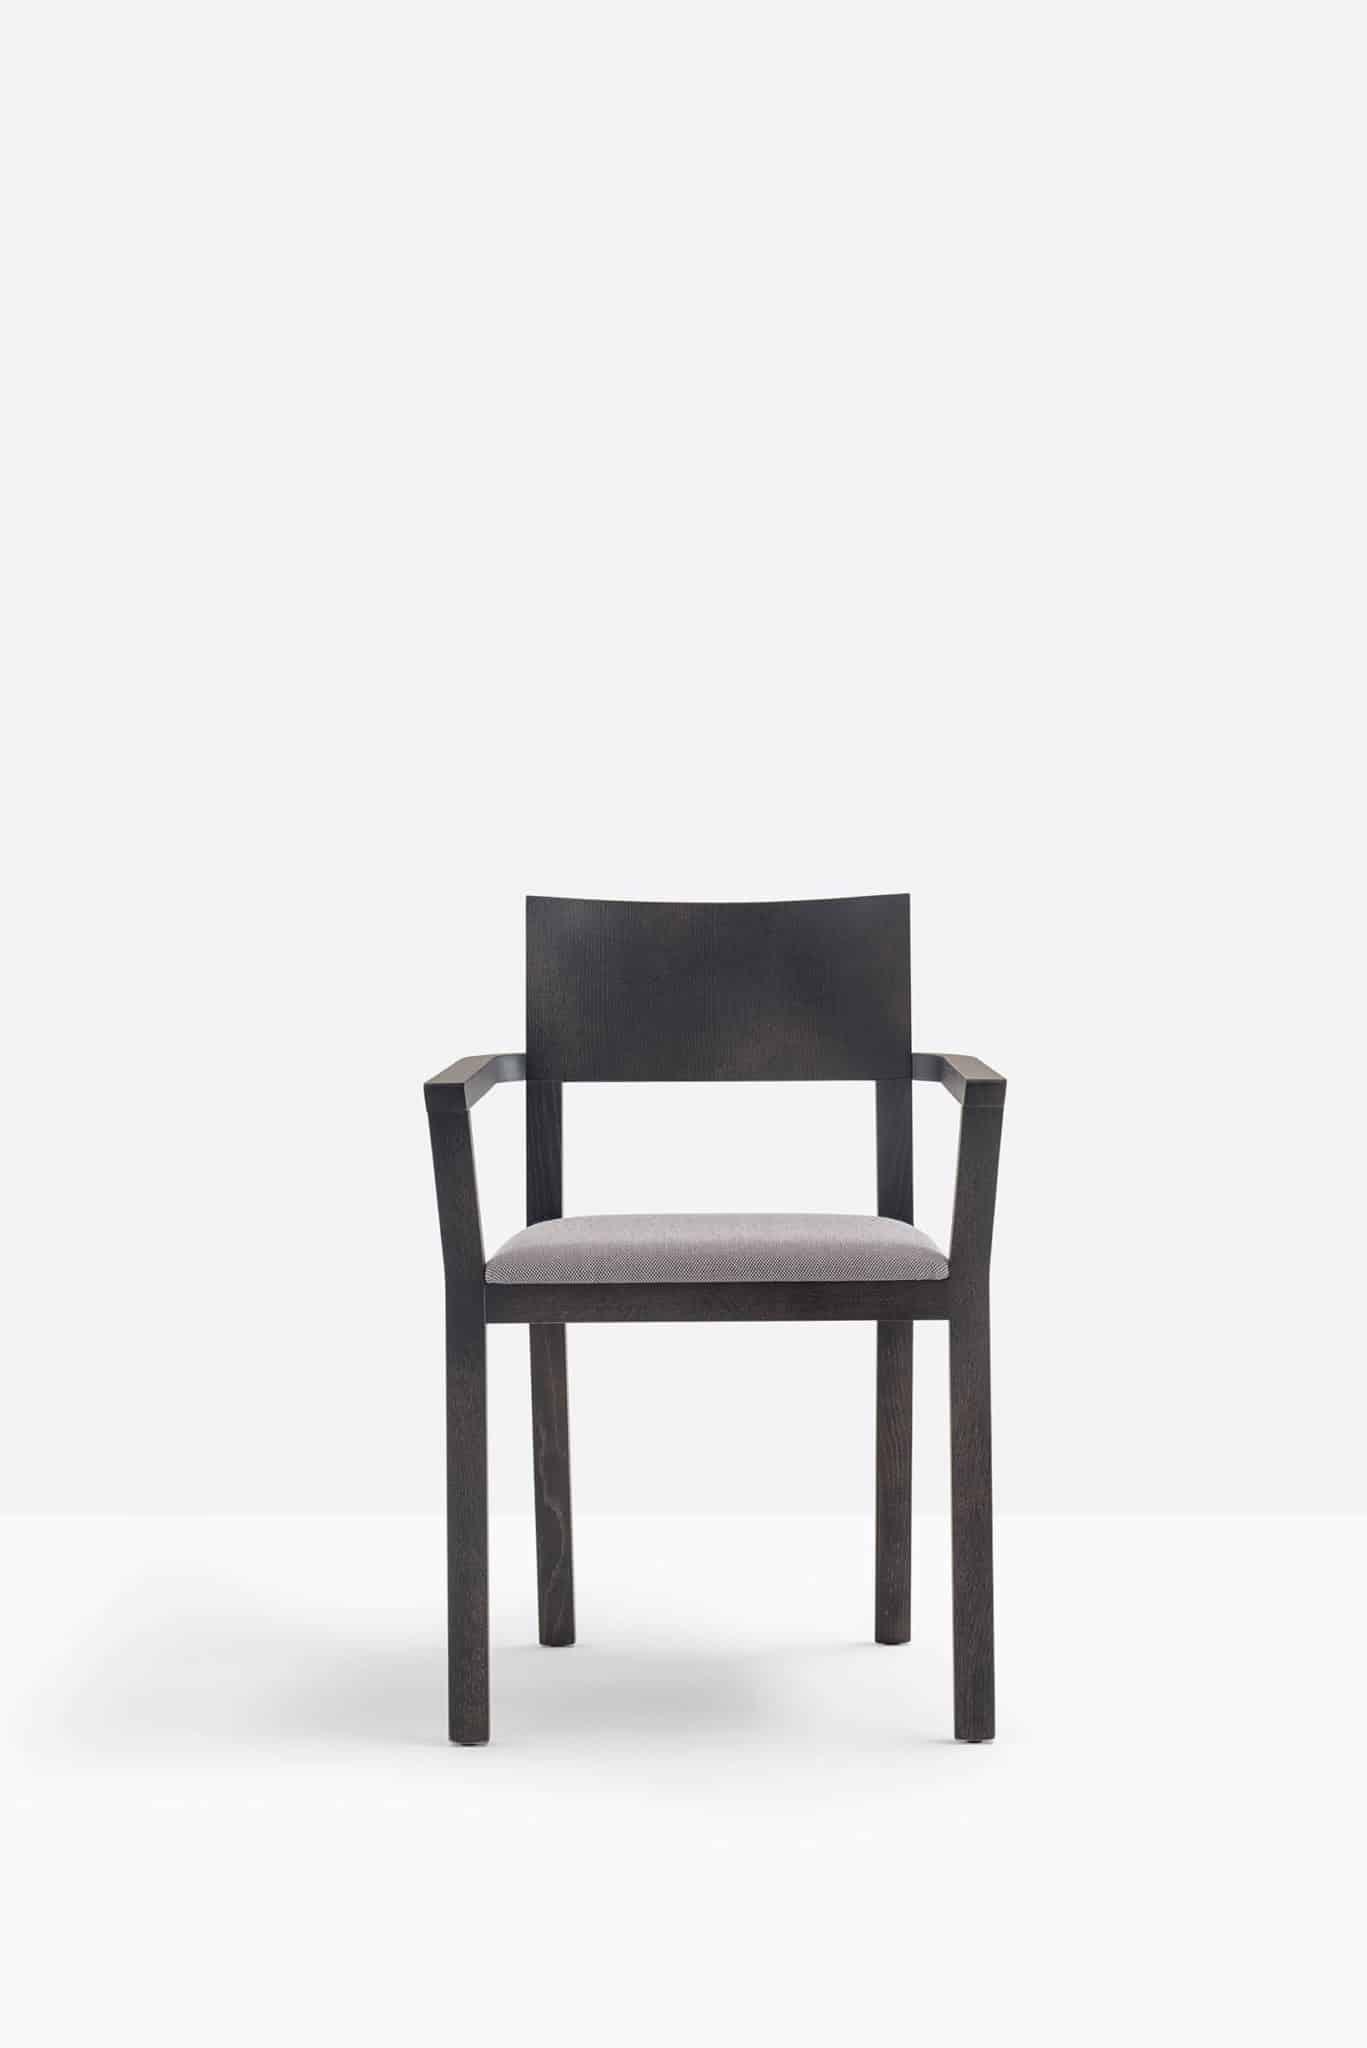 PEDRALI FEEL 451 fauteuil bois assise tissu